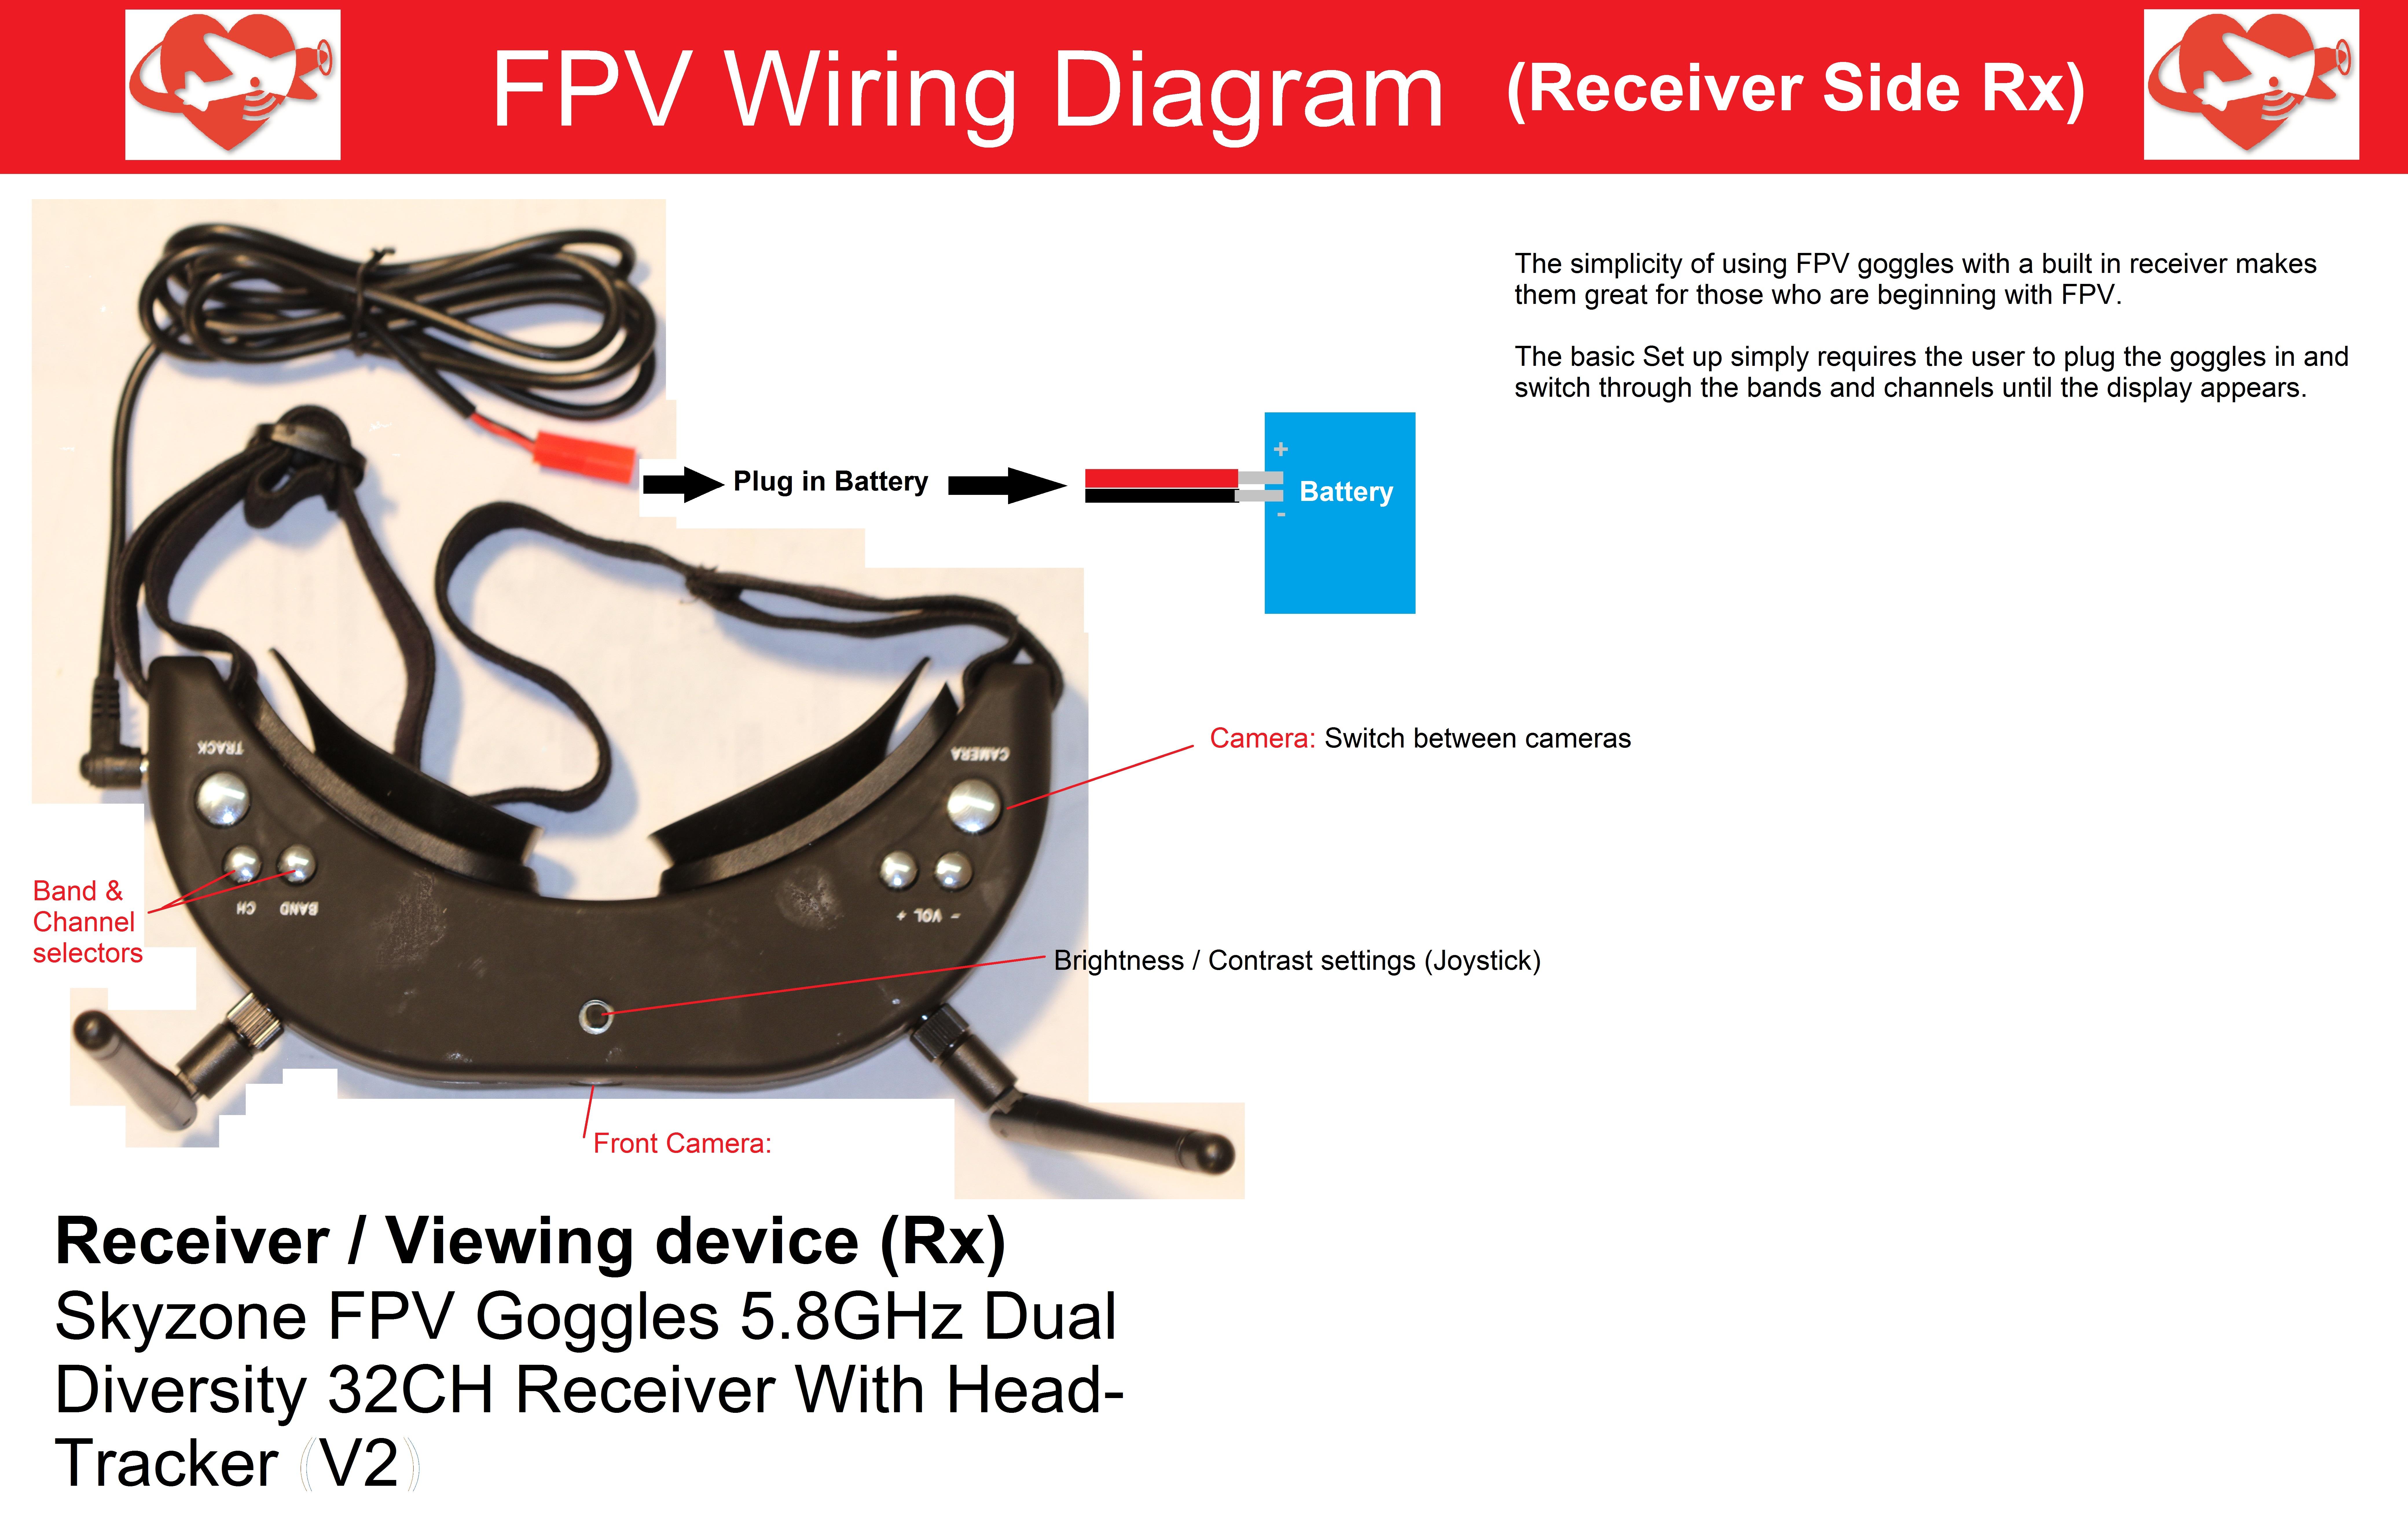 FPV Receiver Side